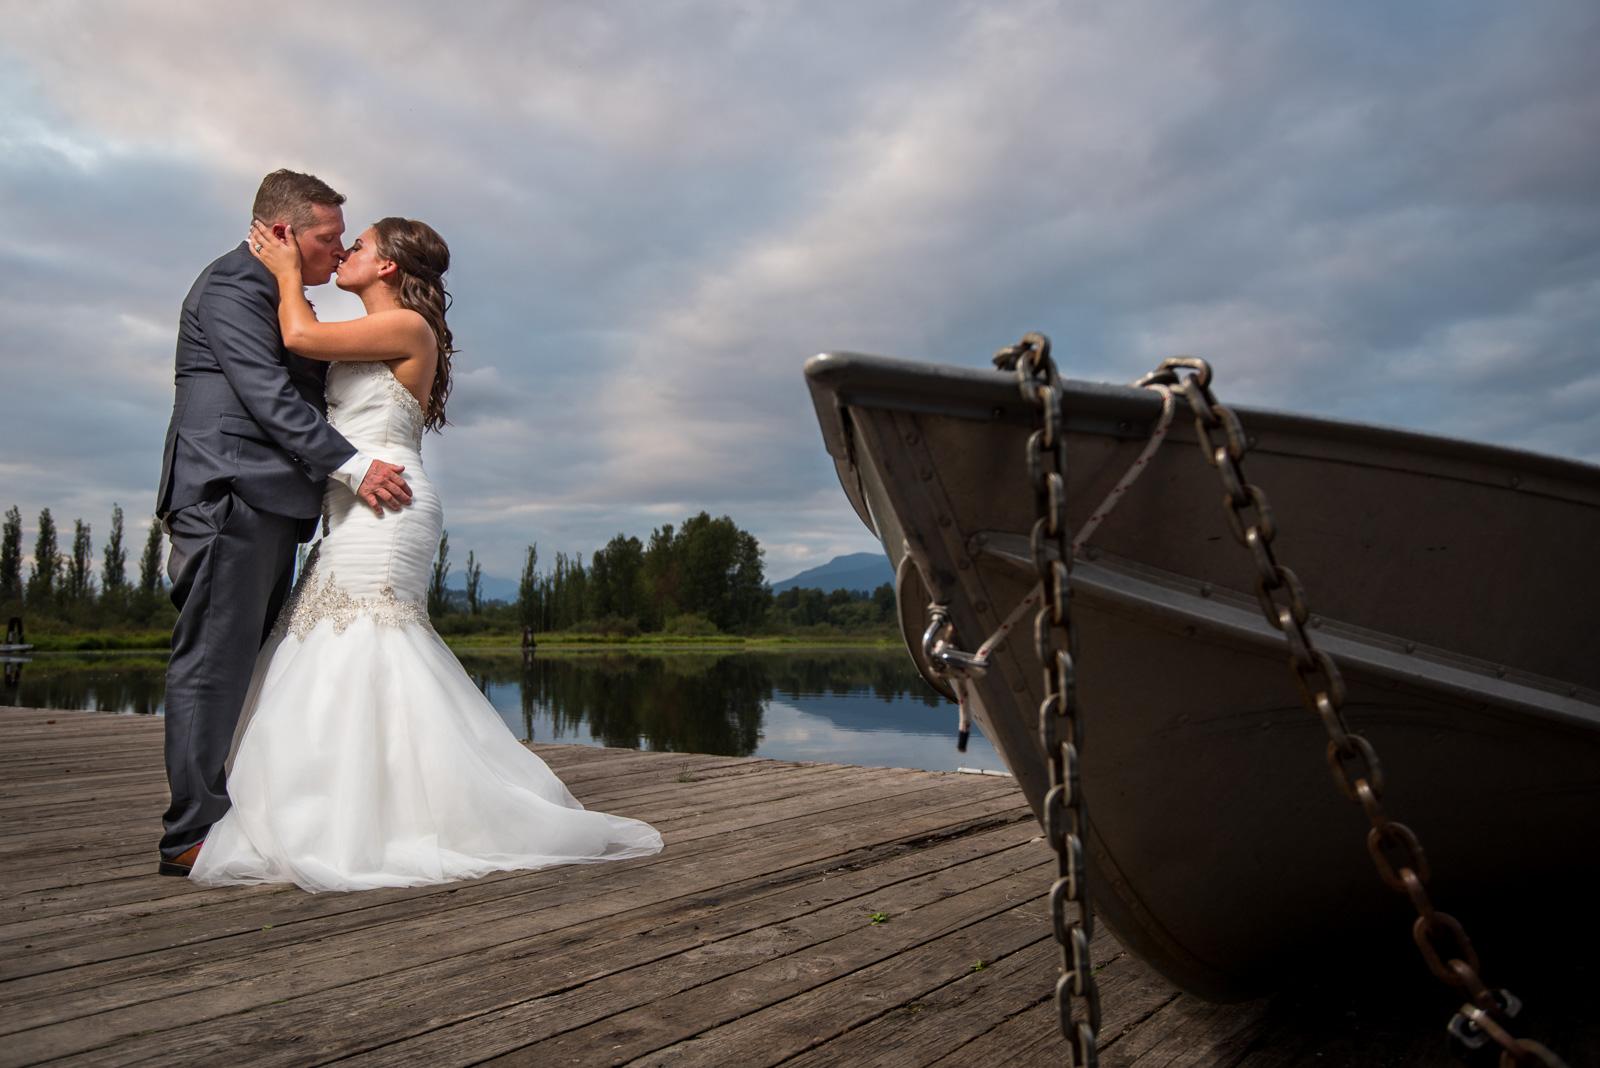 victoria-wedding-photographers-burnaby-mountain-wedding-burnaby-rowing-club-wedding-39.jpg